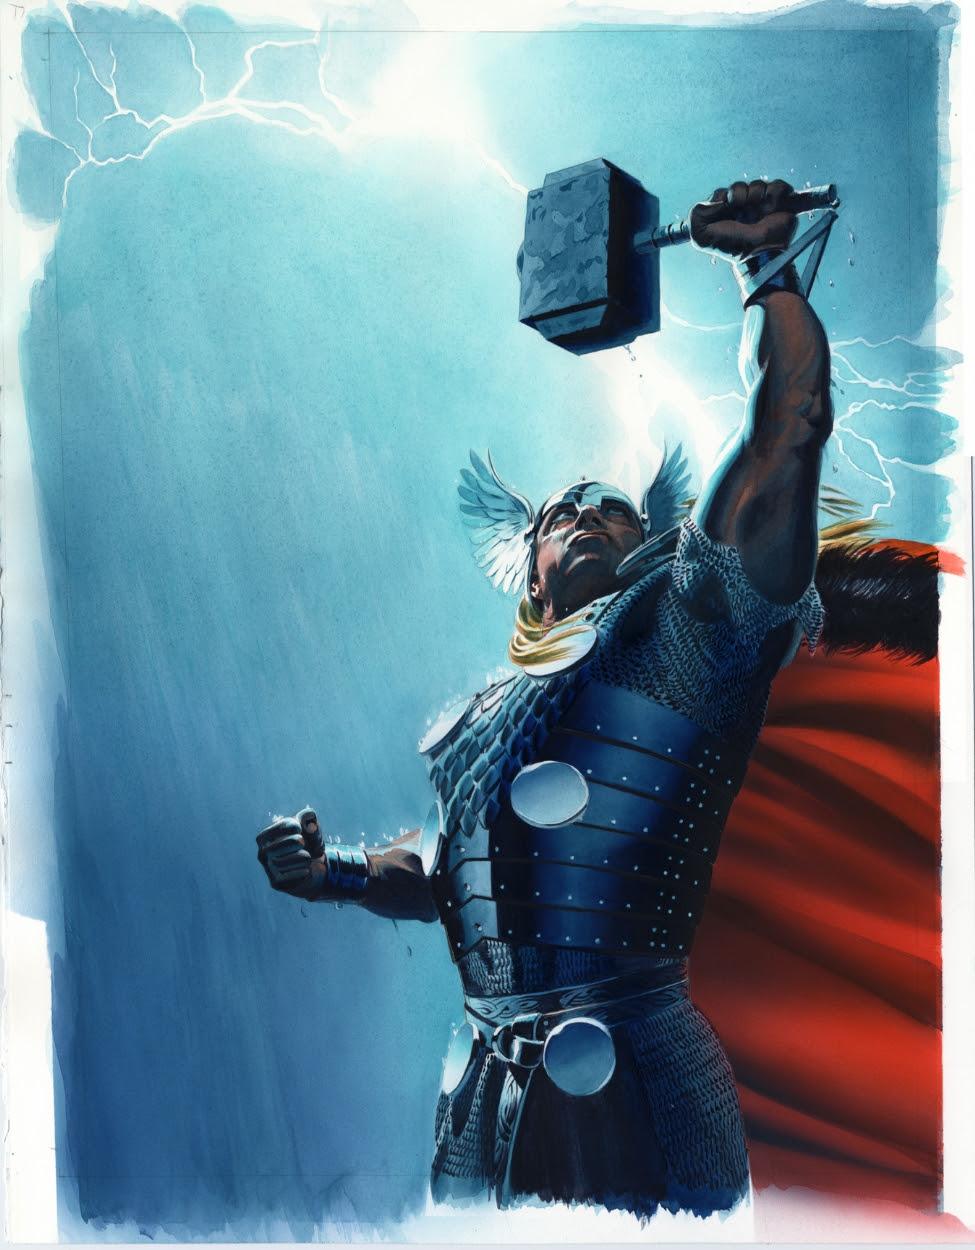 http://fc06.deviantart.net/fs43/f/2009/124/0/9/Wizard_205_Thor_Cover_by_mikemayhew.jpg